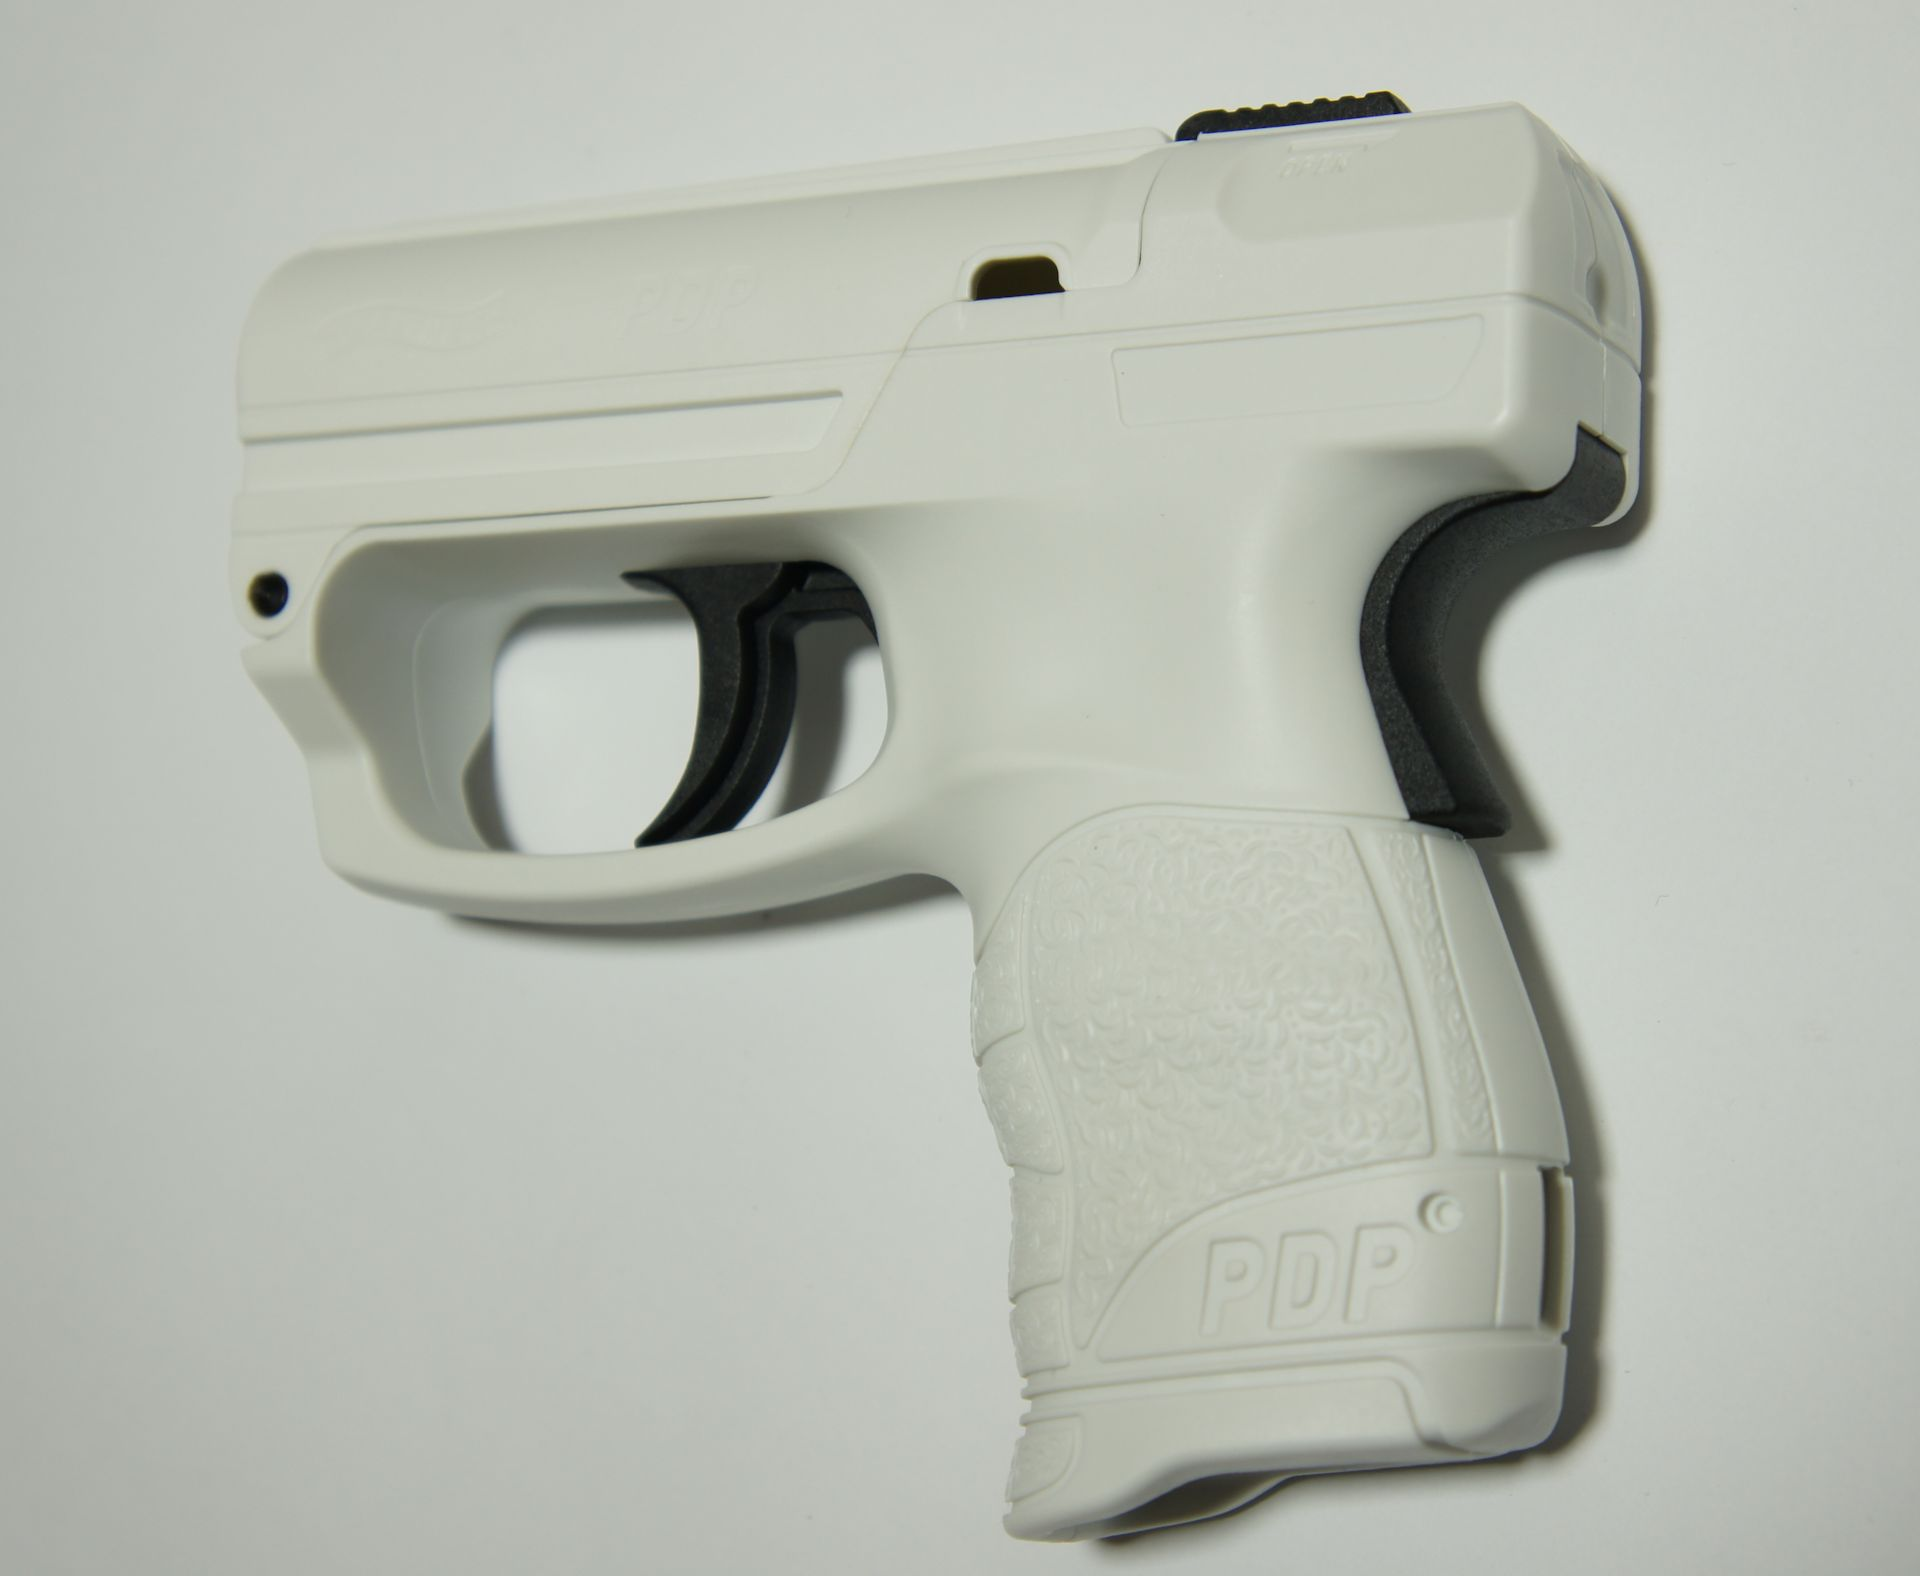 Walther PDP Sprühgerät in weiß